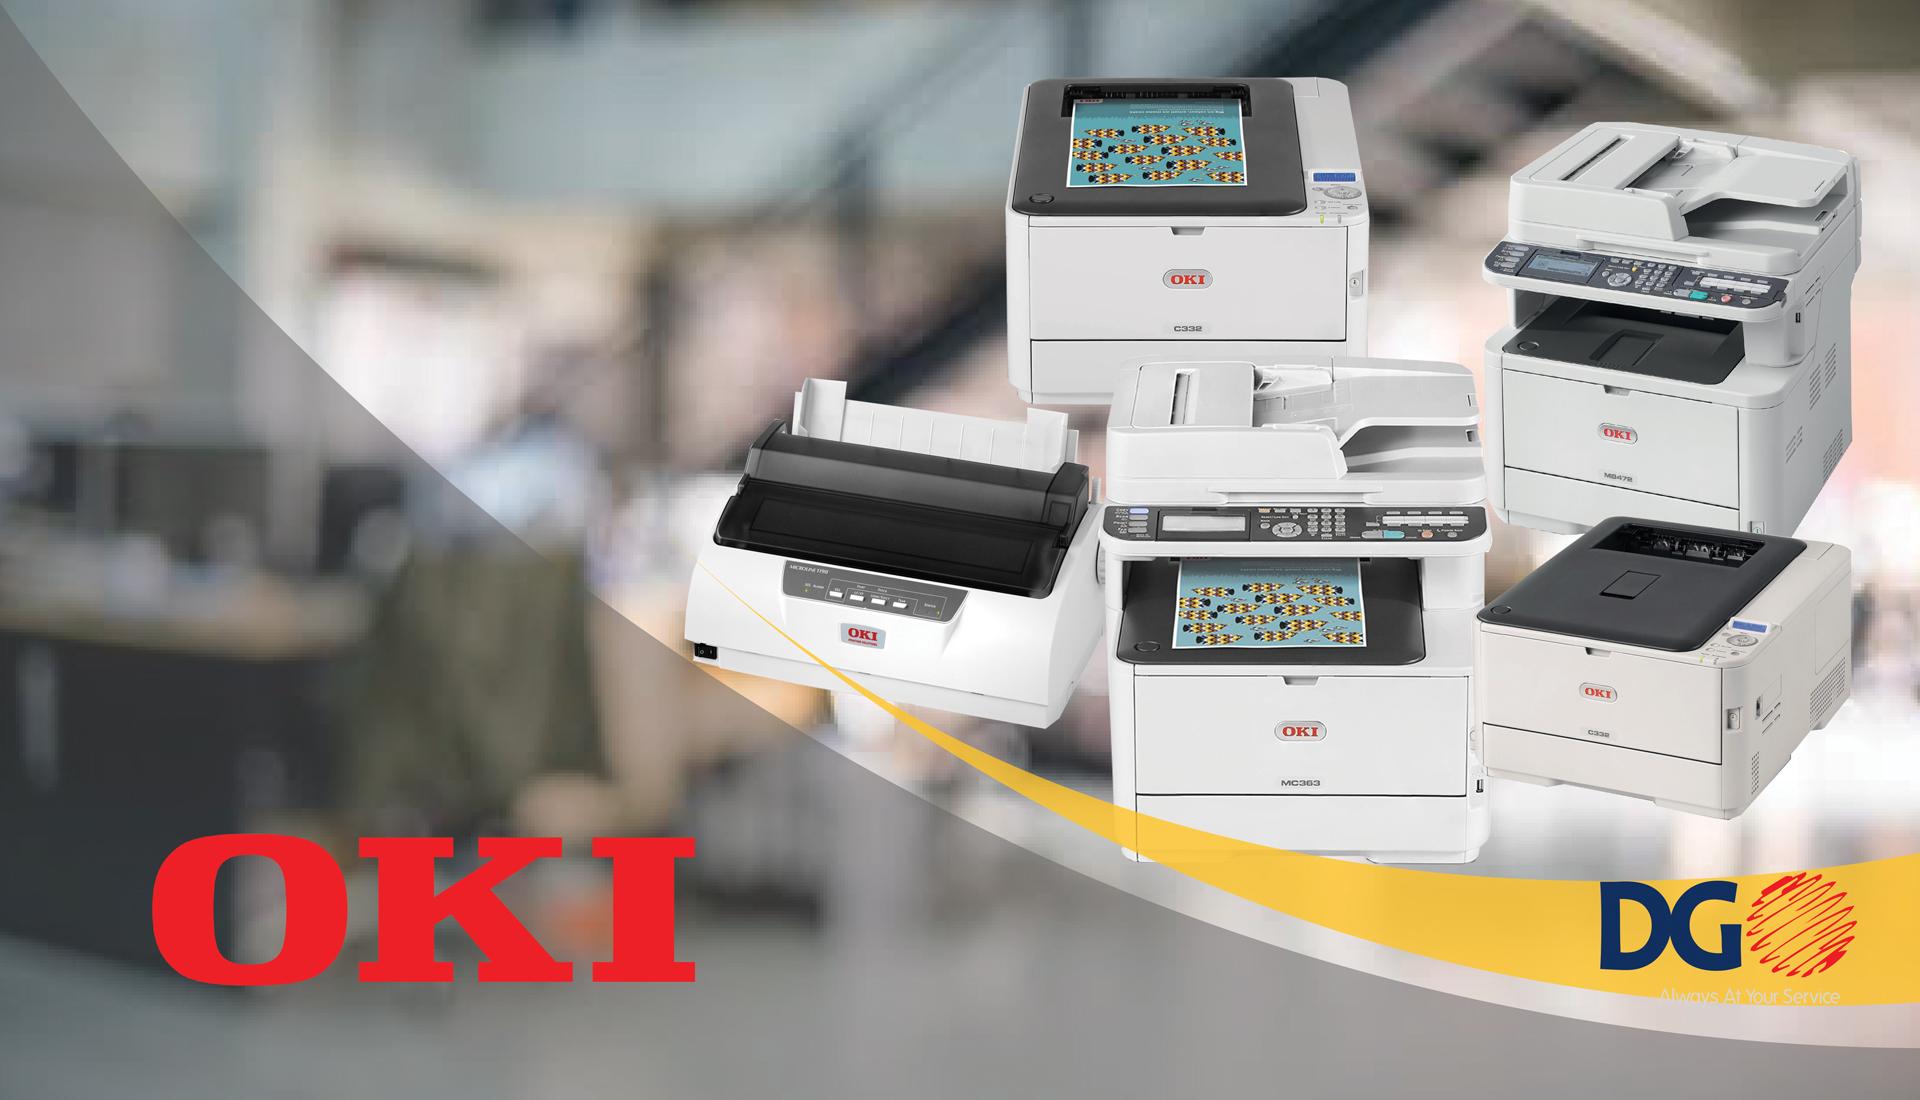 oki printer-banner-resize